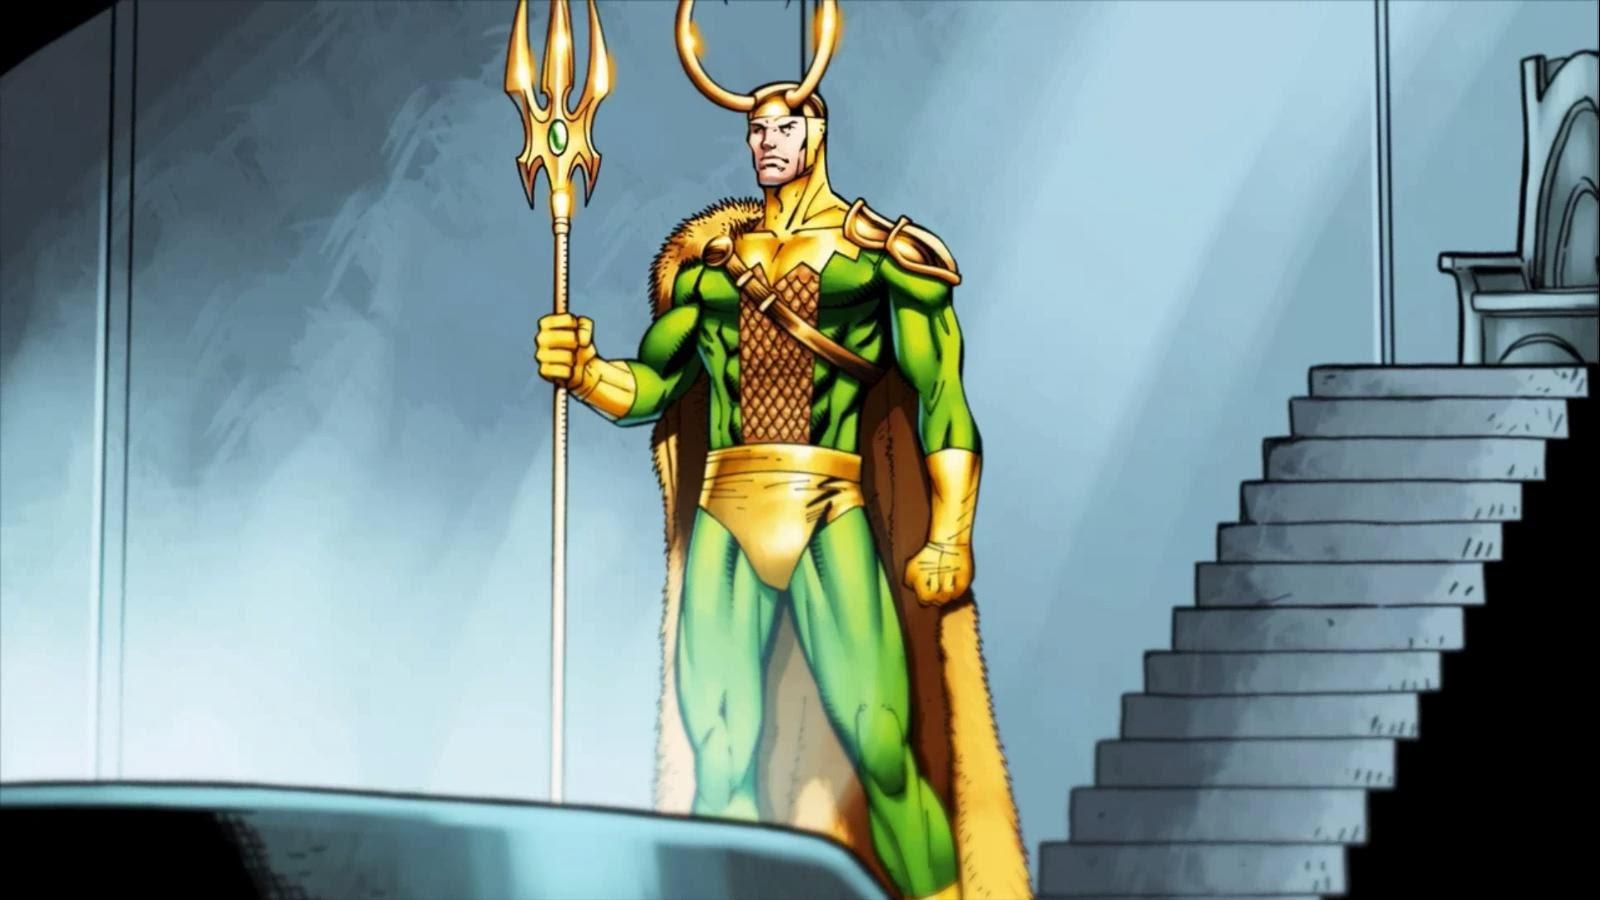 Loki Marvel Avengers images